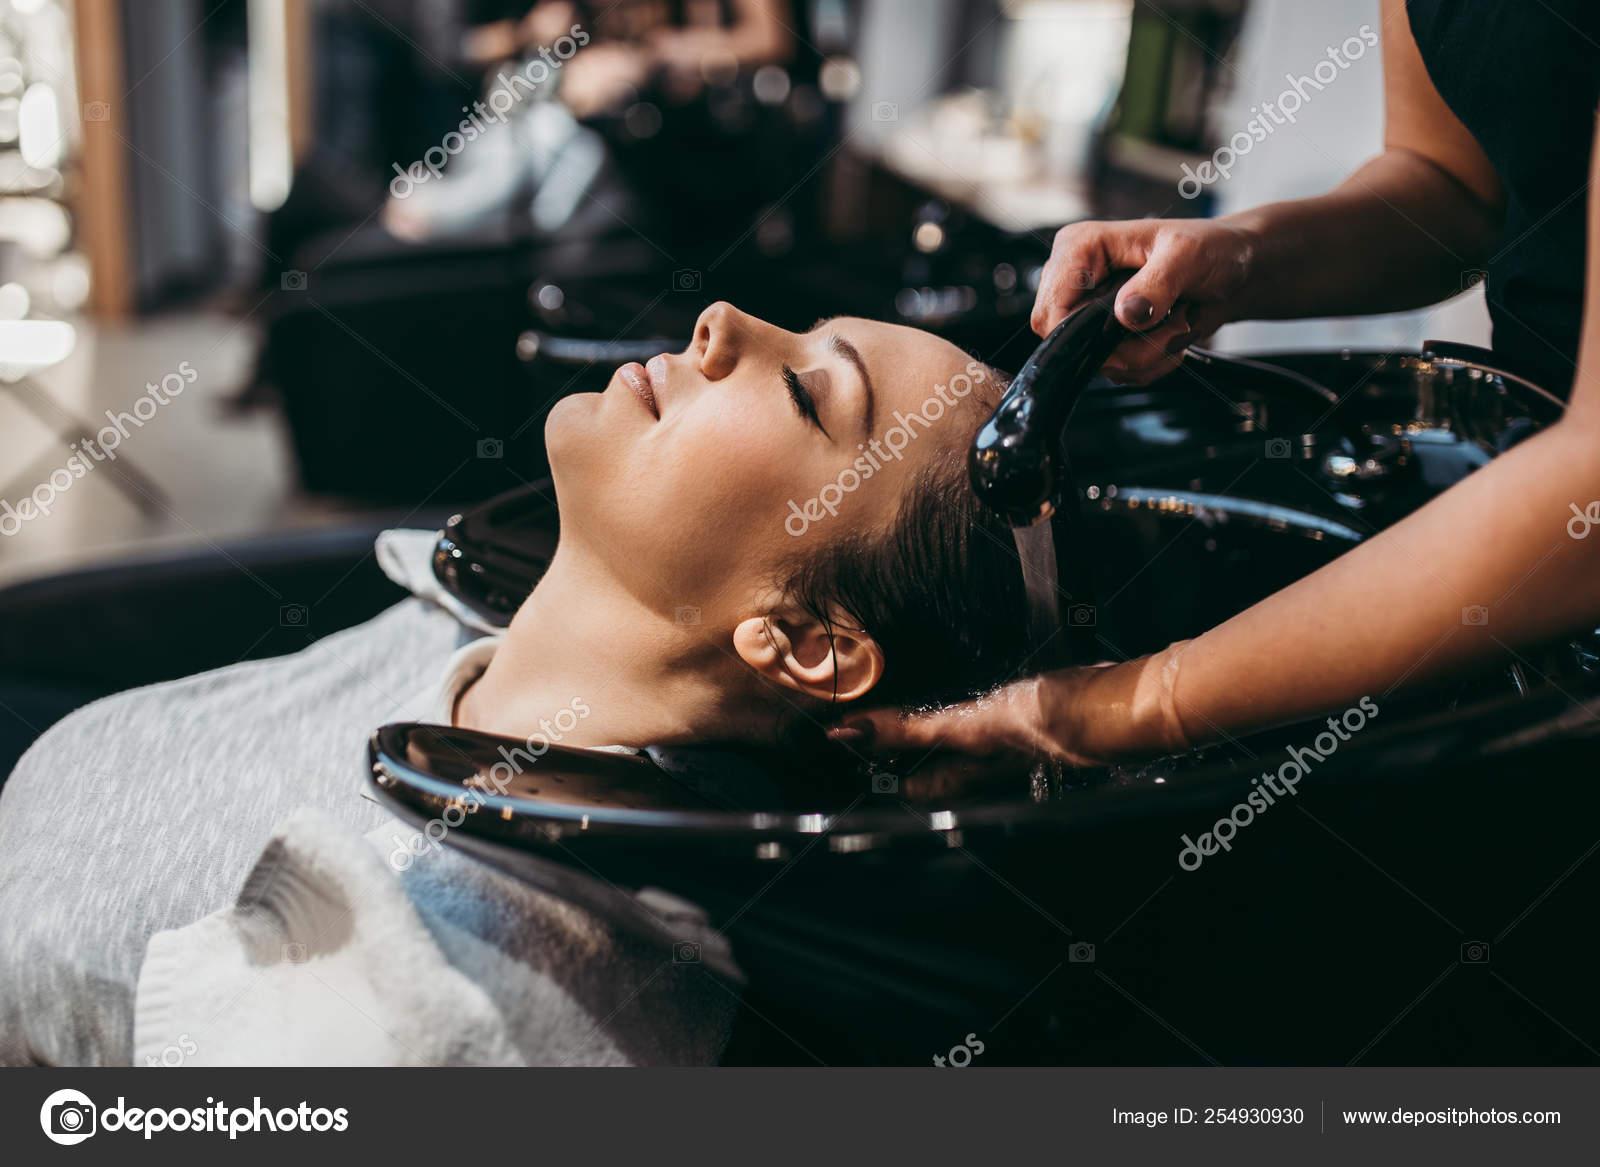 Beautiful Young Woman Getting Hair Wash Hair Salon Styling Concept Stock Photo C Duxx73 254930930